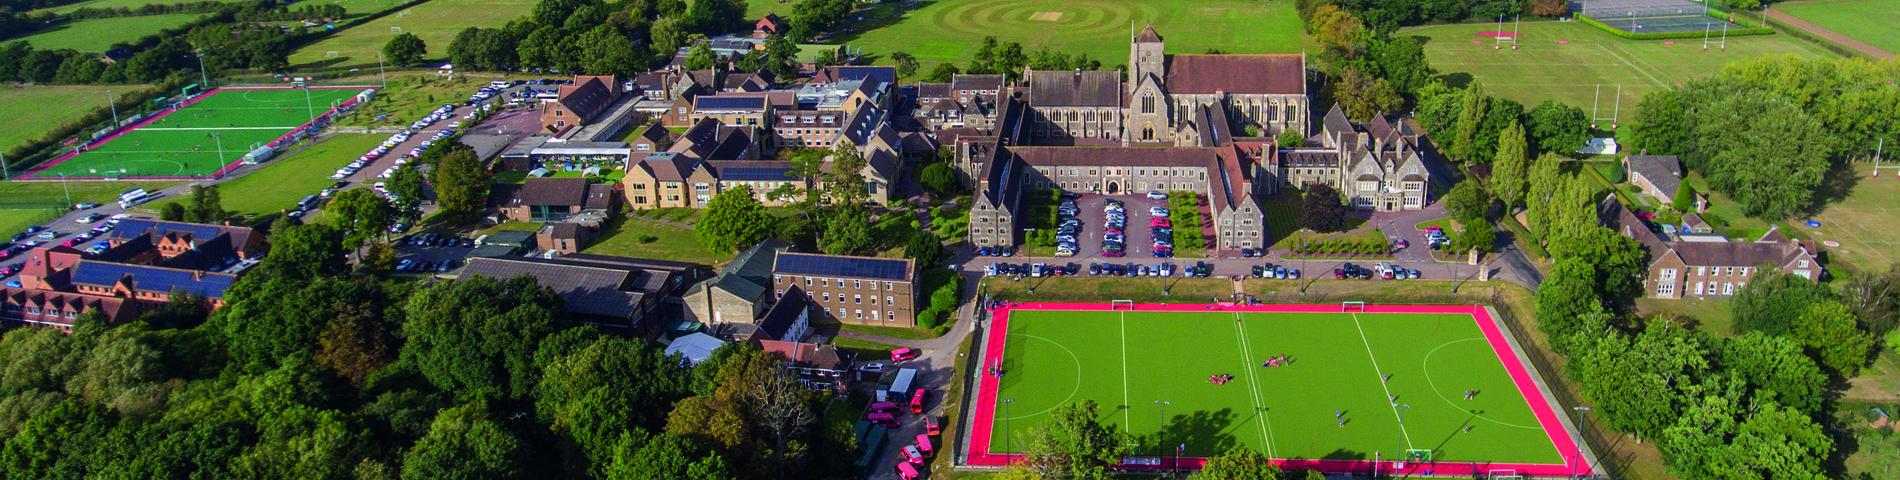 Manor Courses International Summer School bild 1